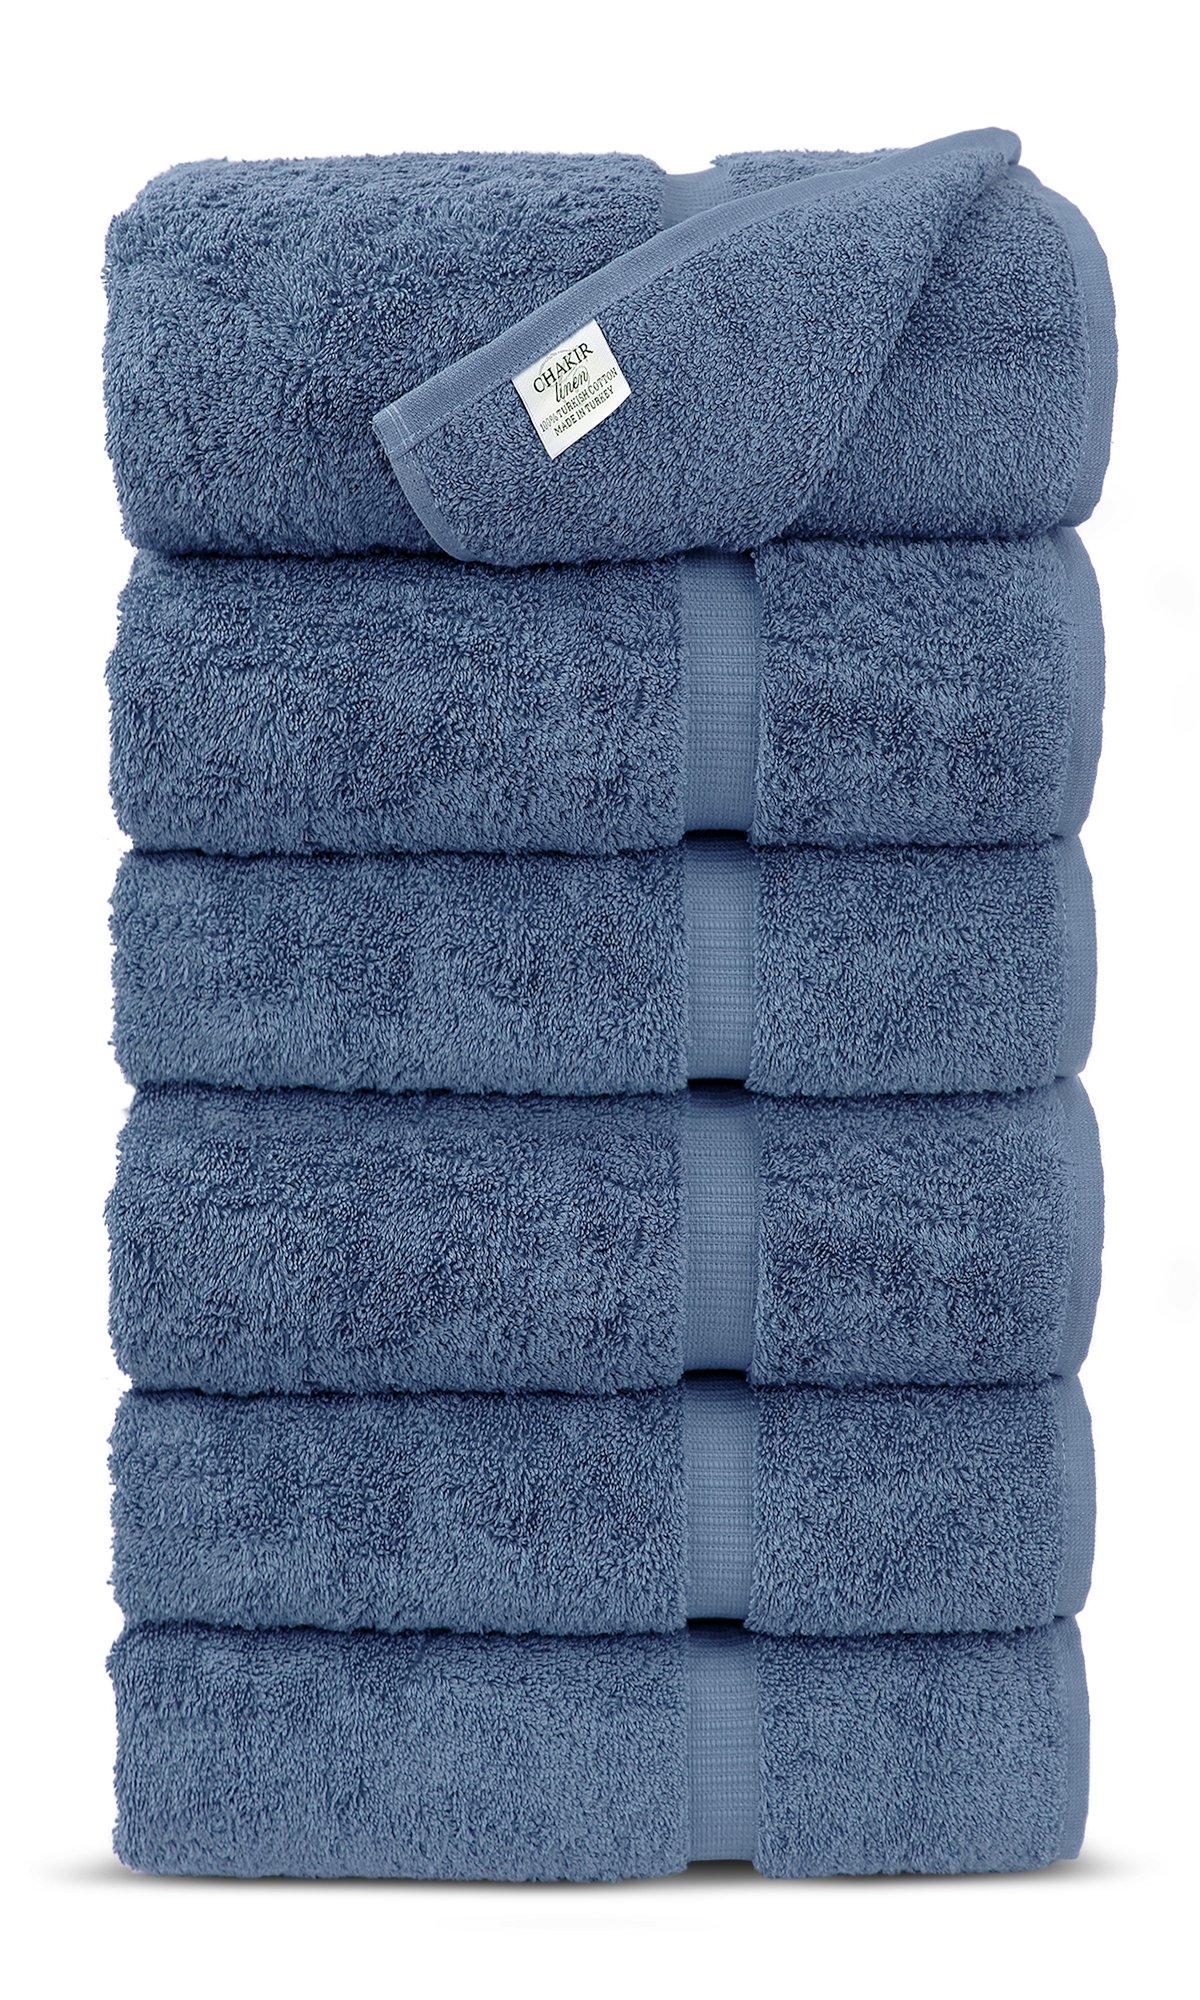 Luxury Premium long-stable Hotel & Spa Turkish Cotton 6-Piece Eco-Friendly Hand Towel Set (Wedgewood)